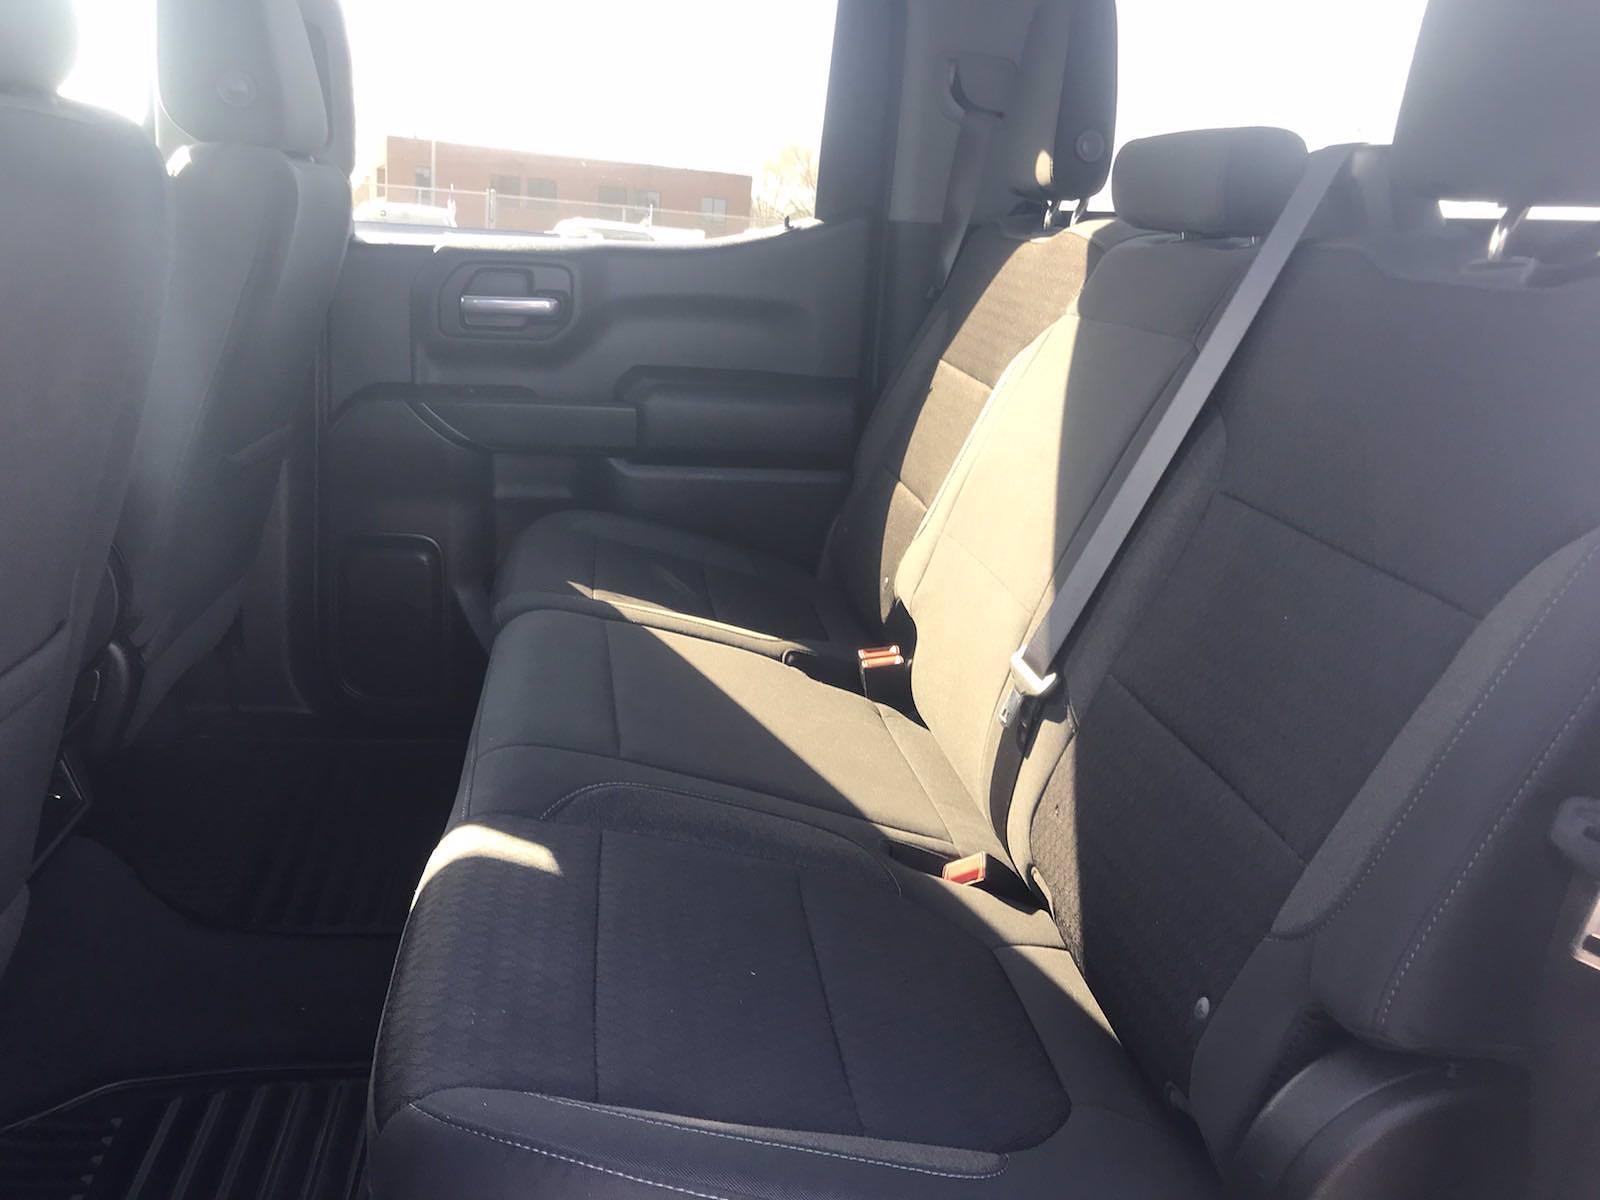 2020 Chevrolet Silverado 1500 Crew Cab 4x4, Pickup #16465P - photo 37